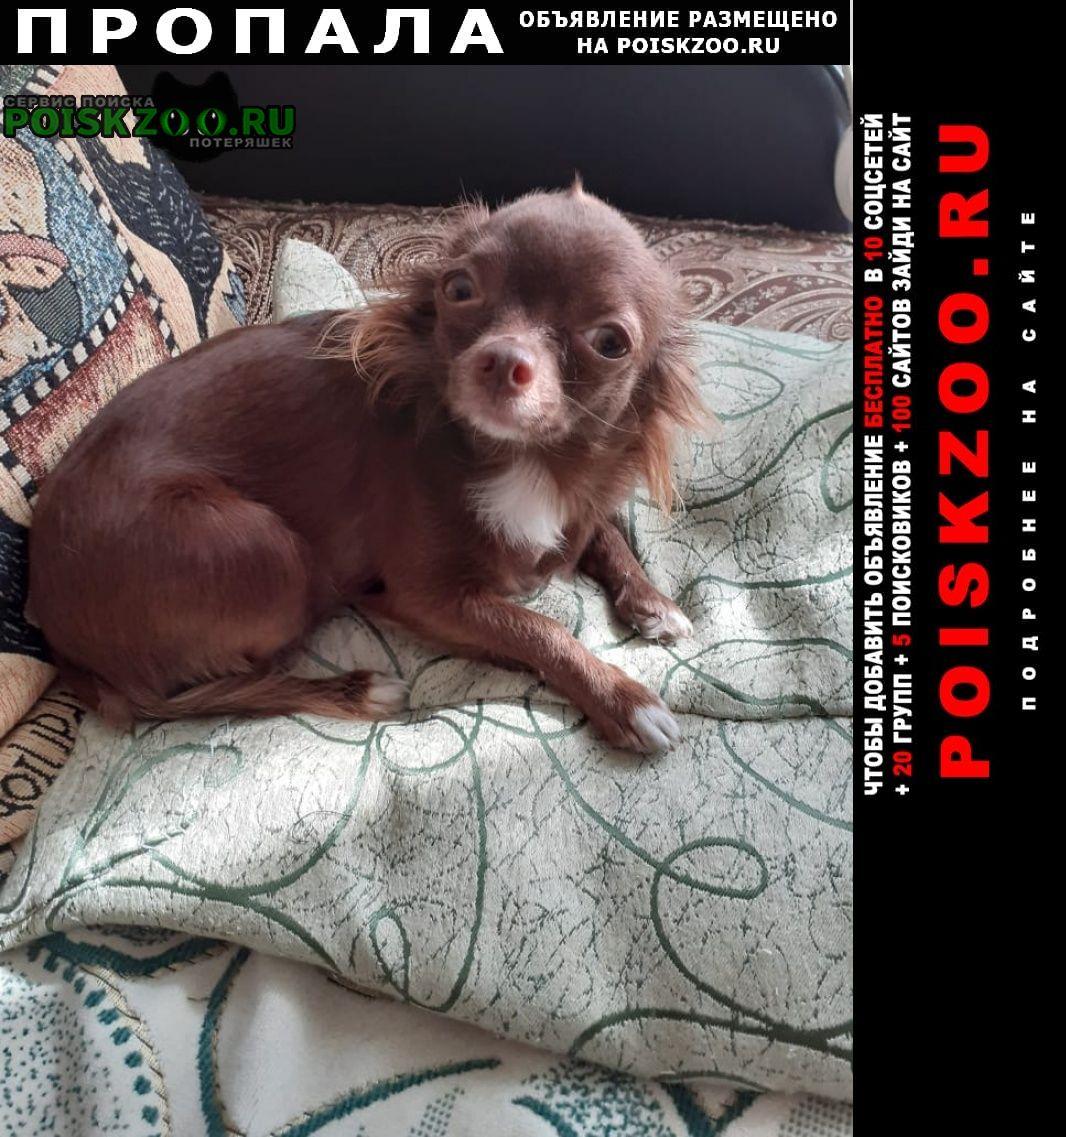 Пропала собака Геленджик